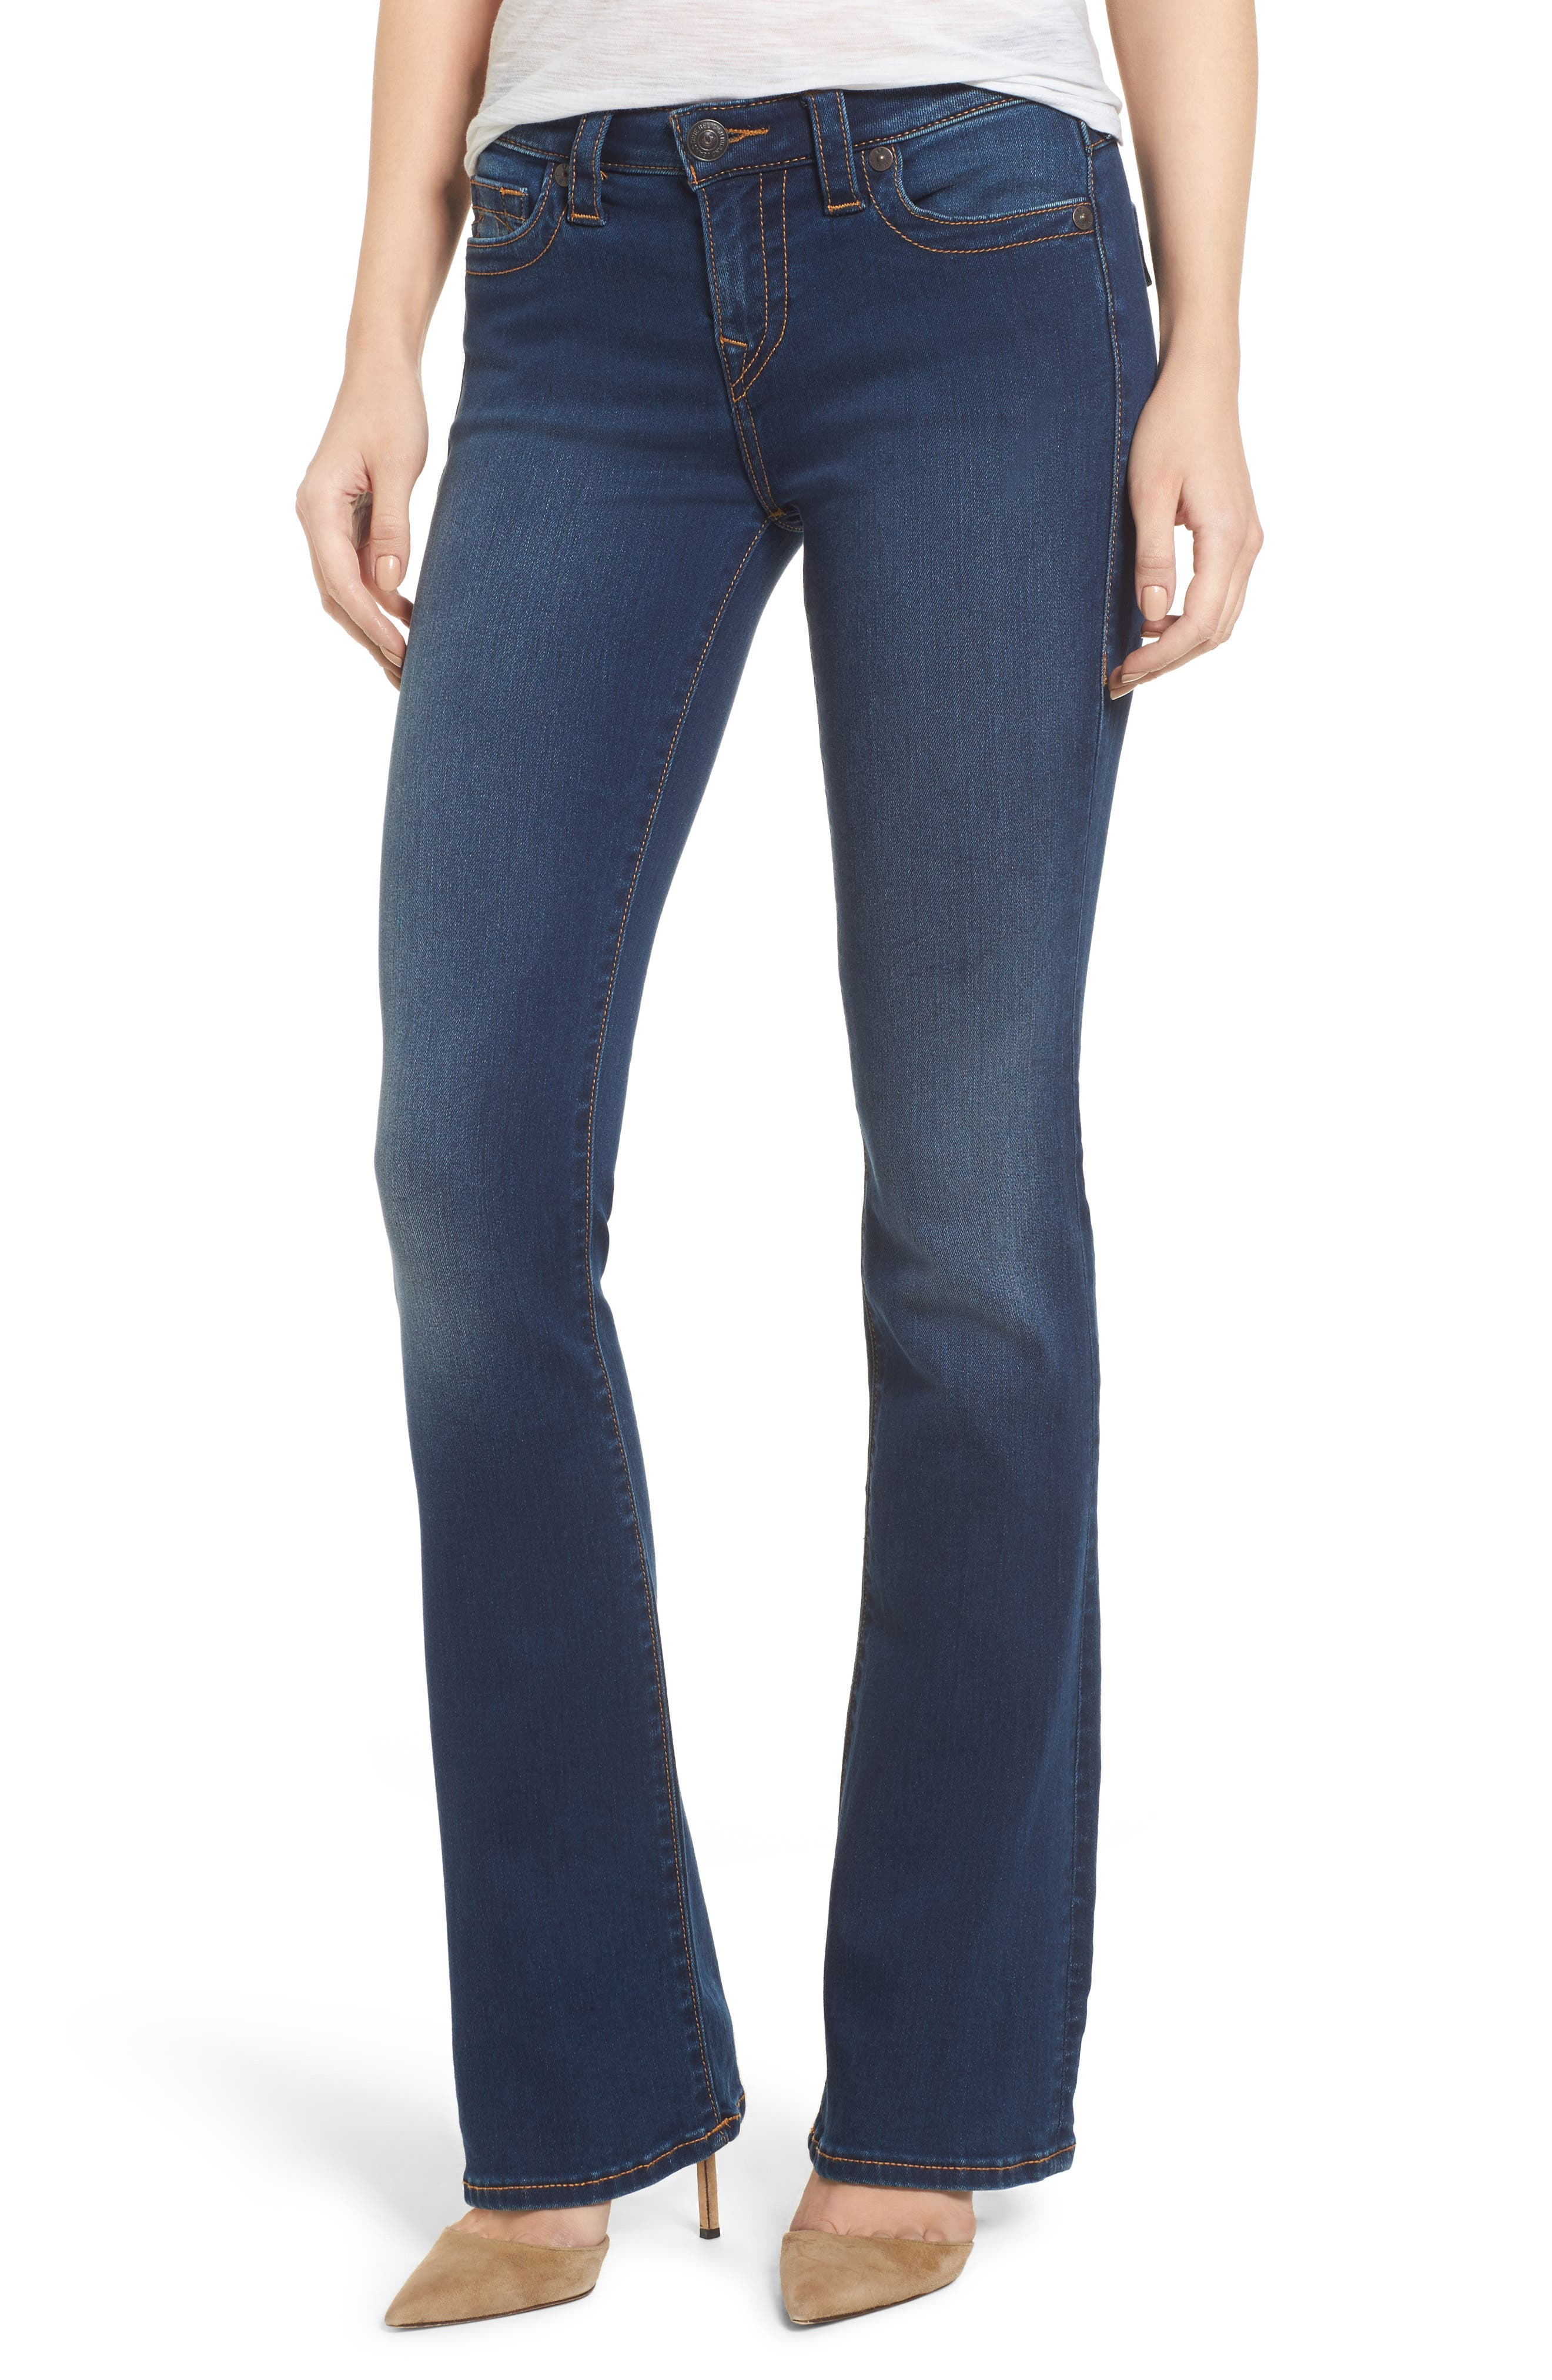 Main Image - True Religion Brand Jeans Becca Bootcut Jeans (Lands End Indigo)